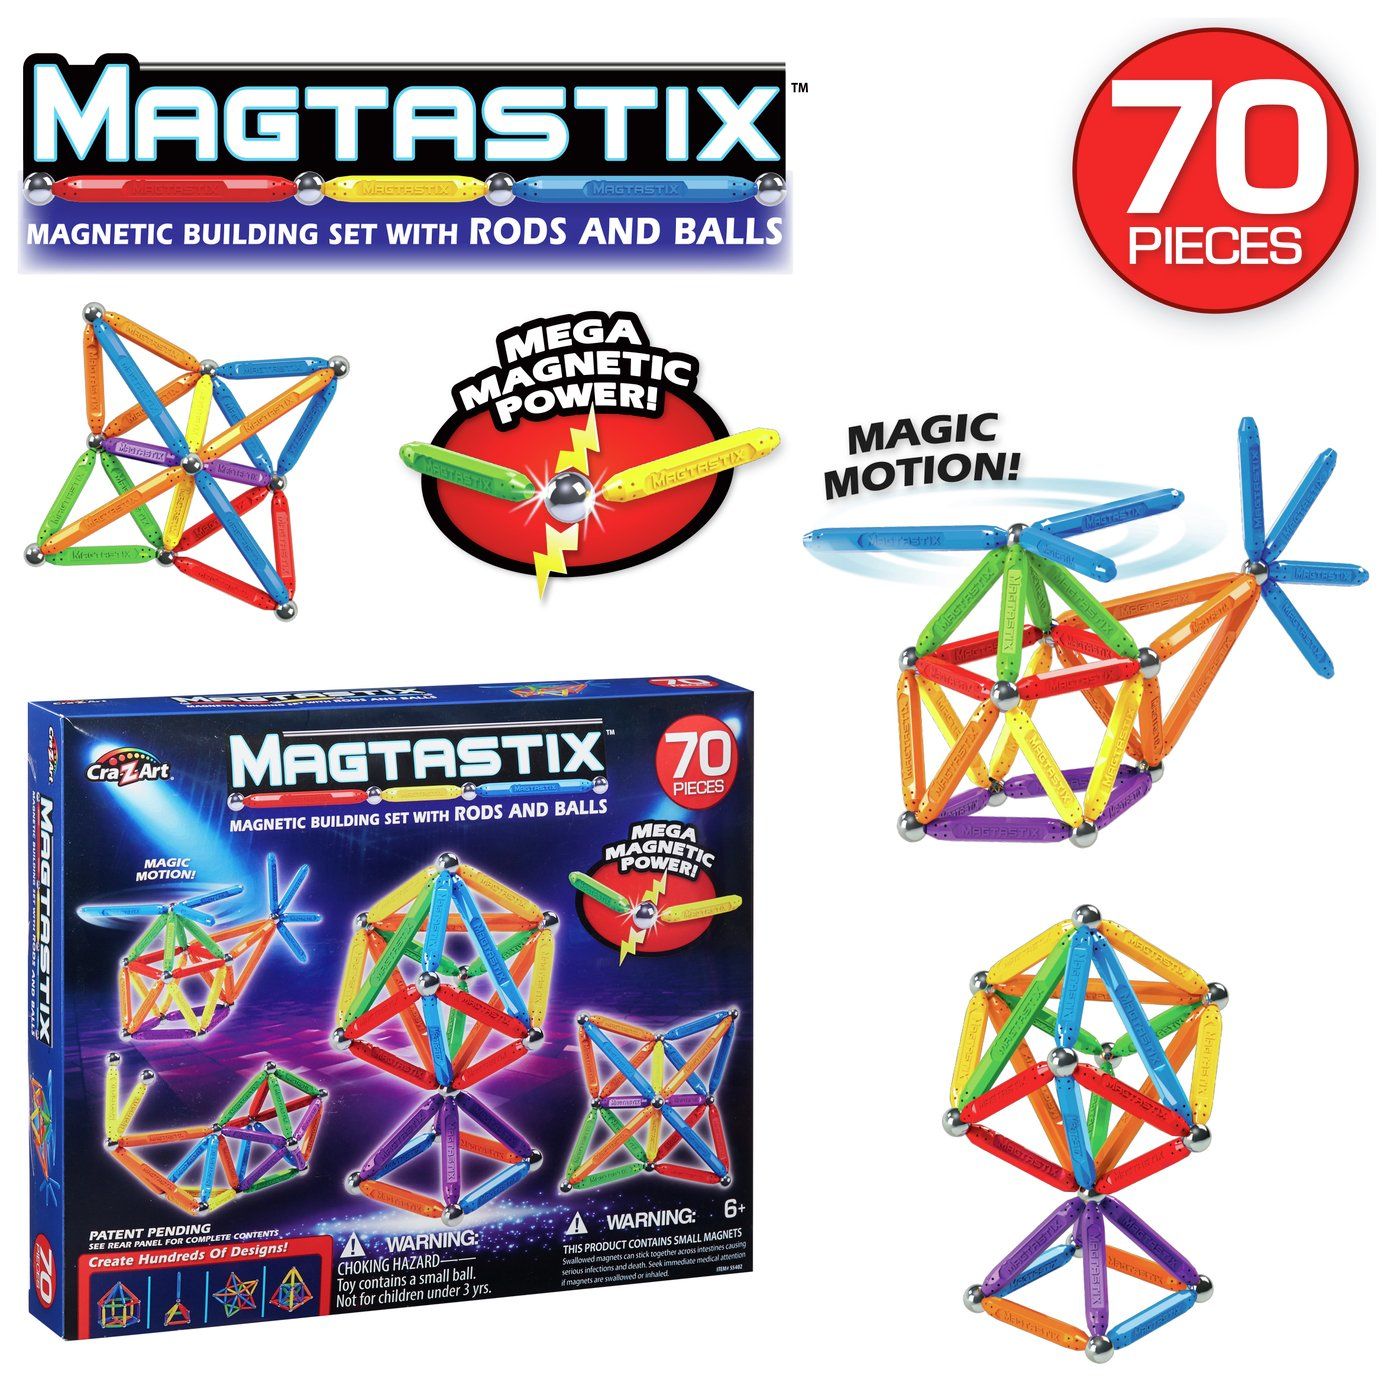 magtastix-building-set-70-piece